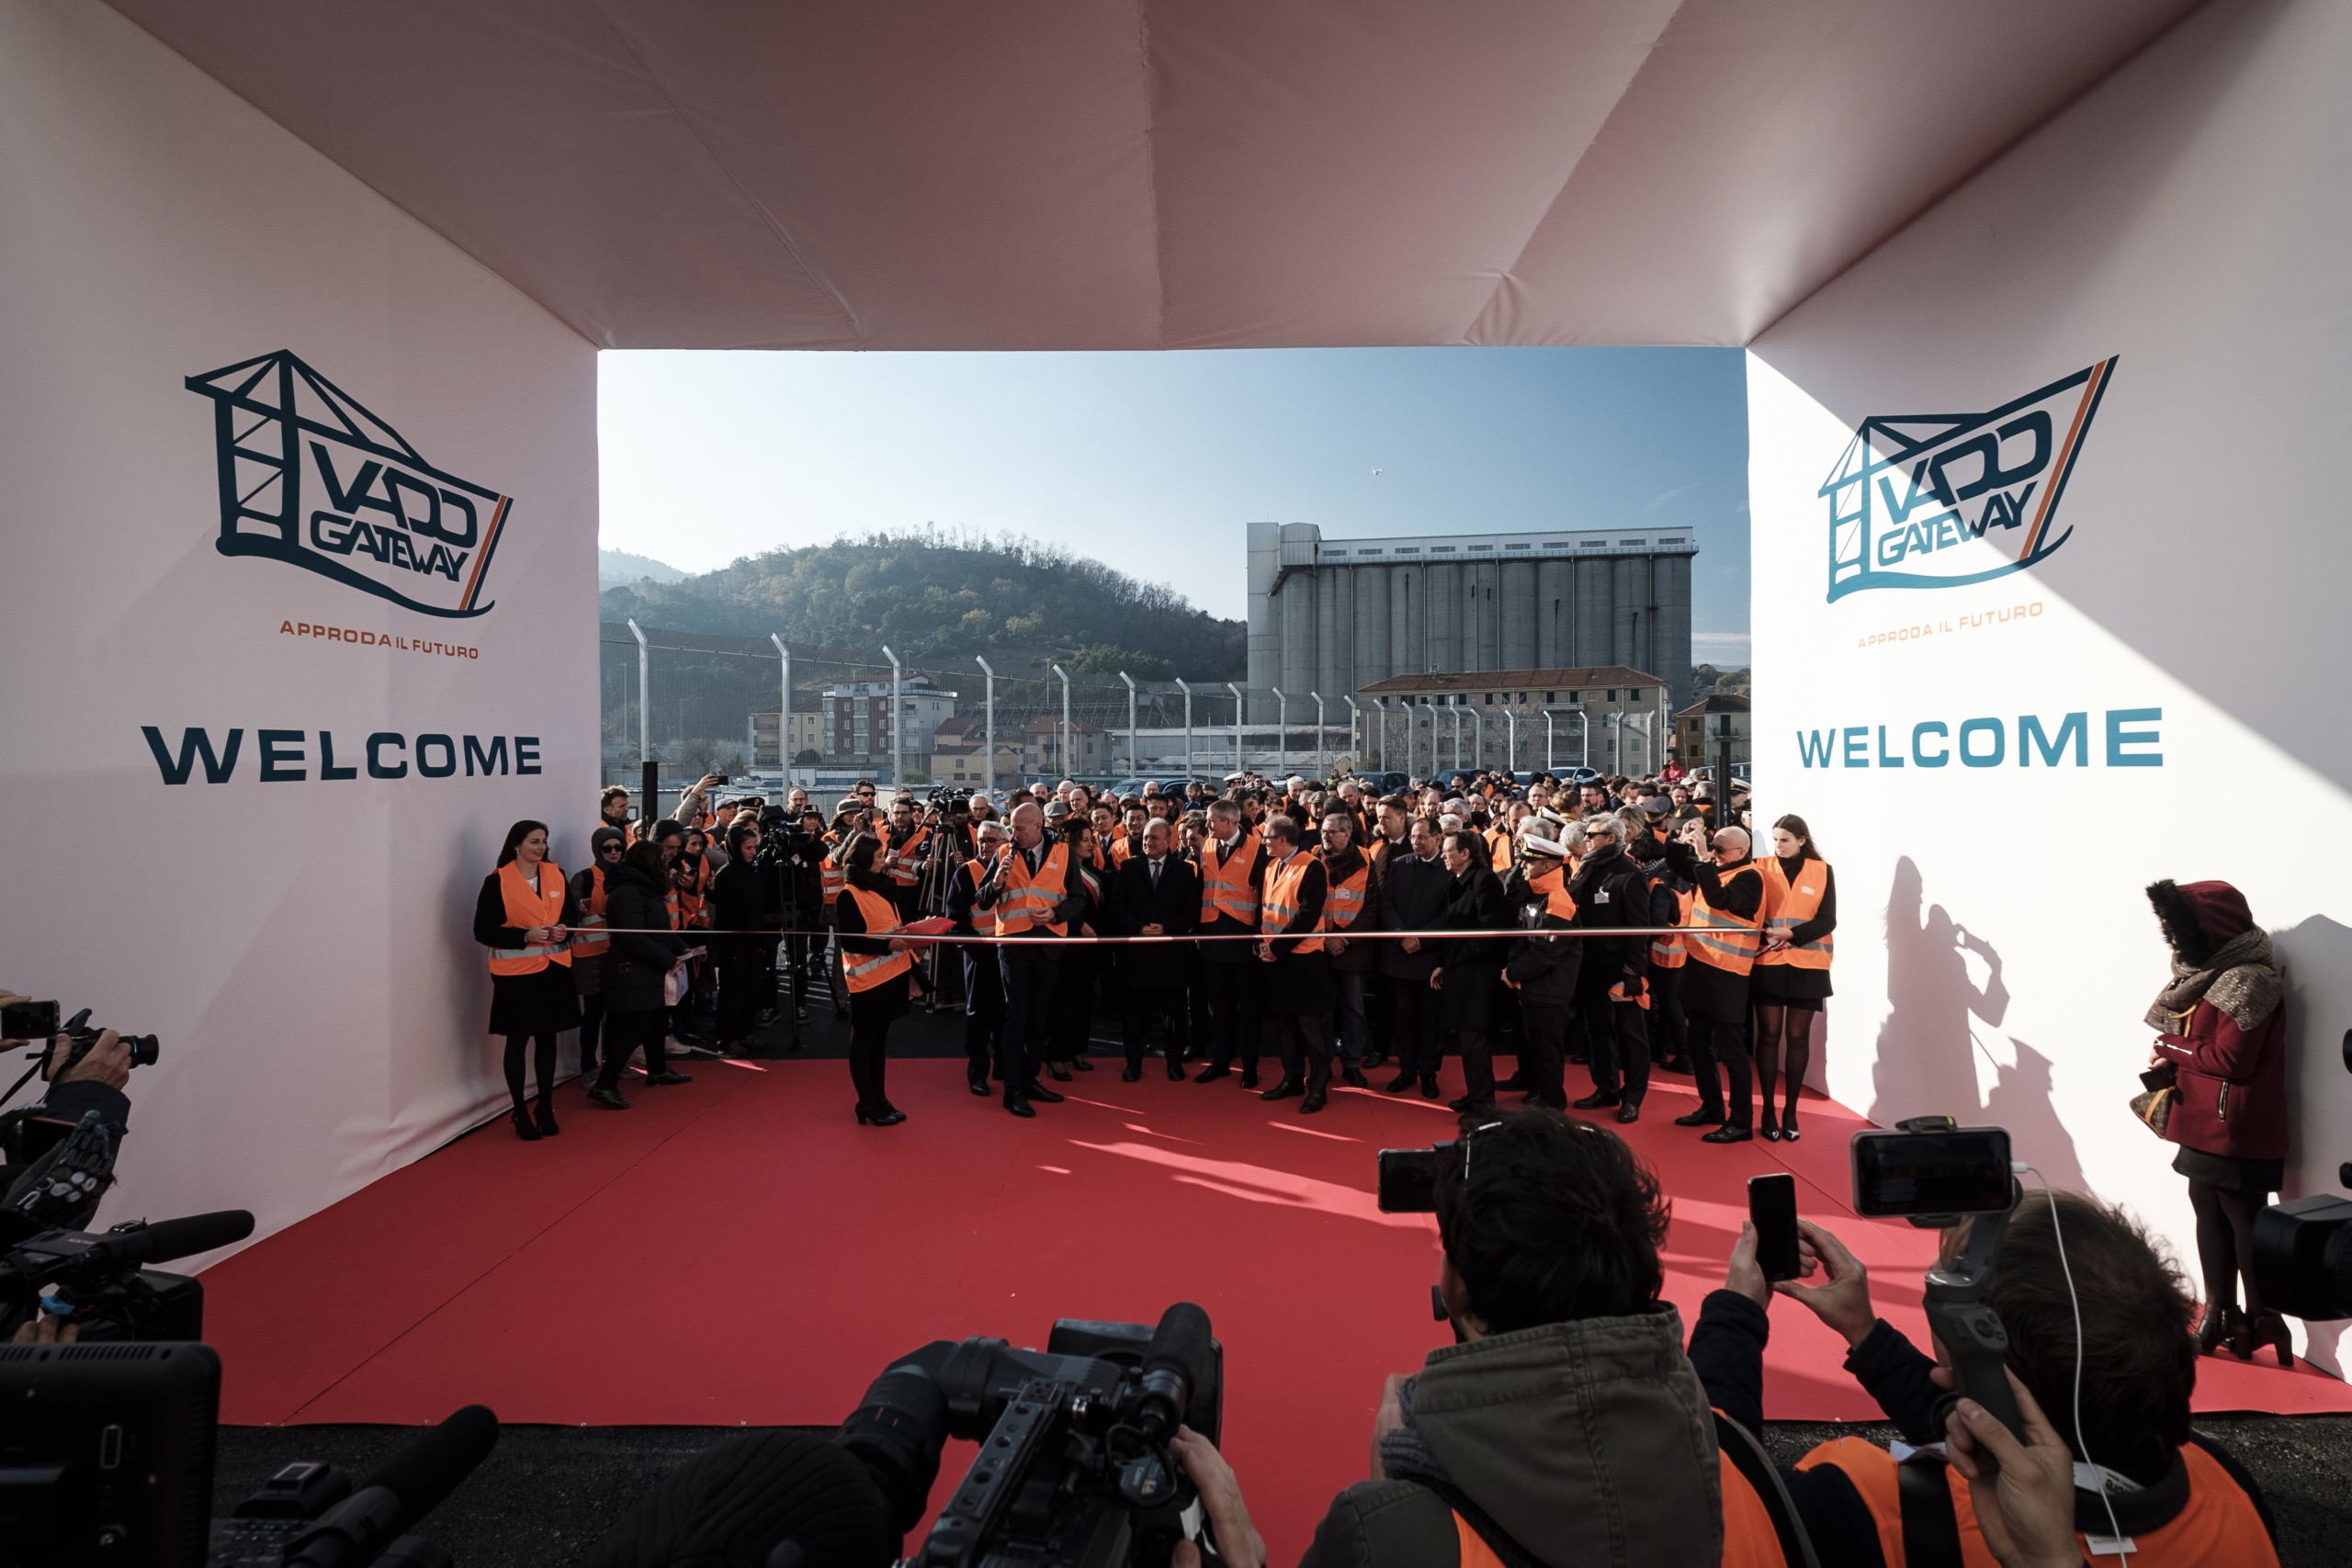 vado-gateway-opening-gruppo-peroni-eventi-02